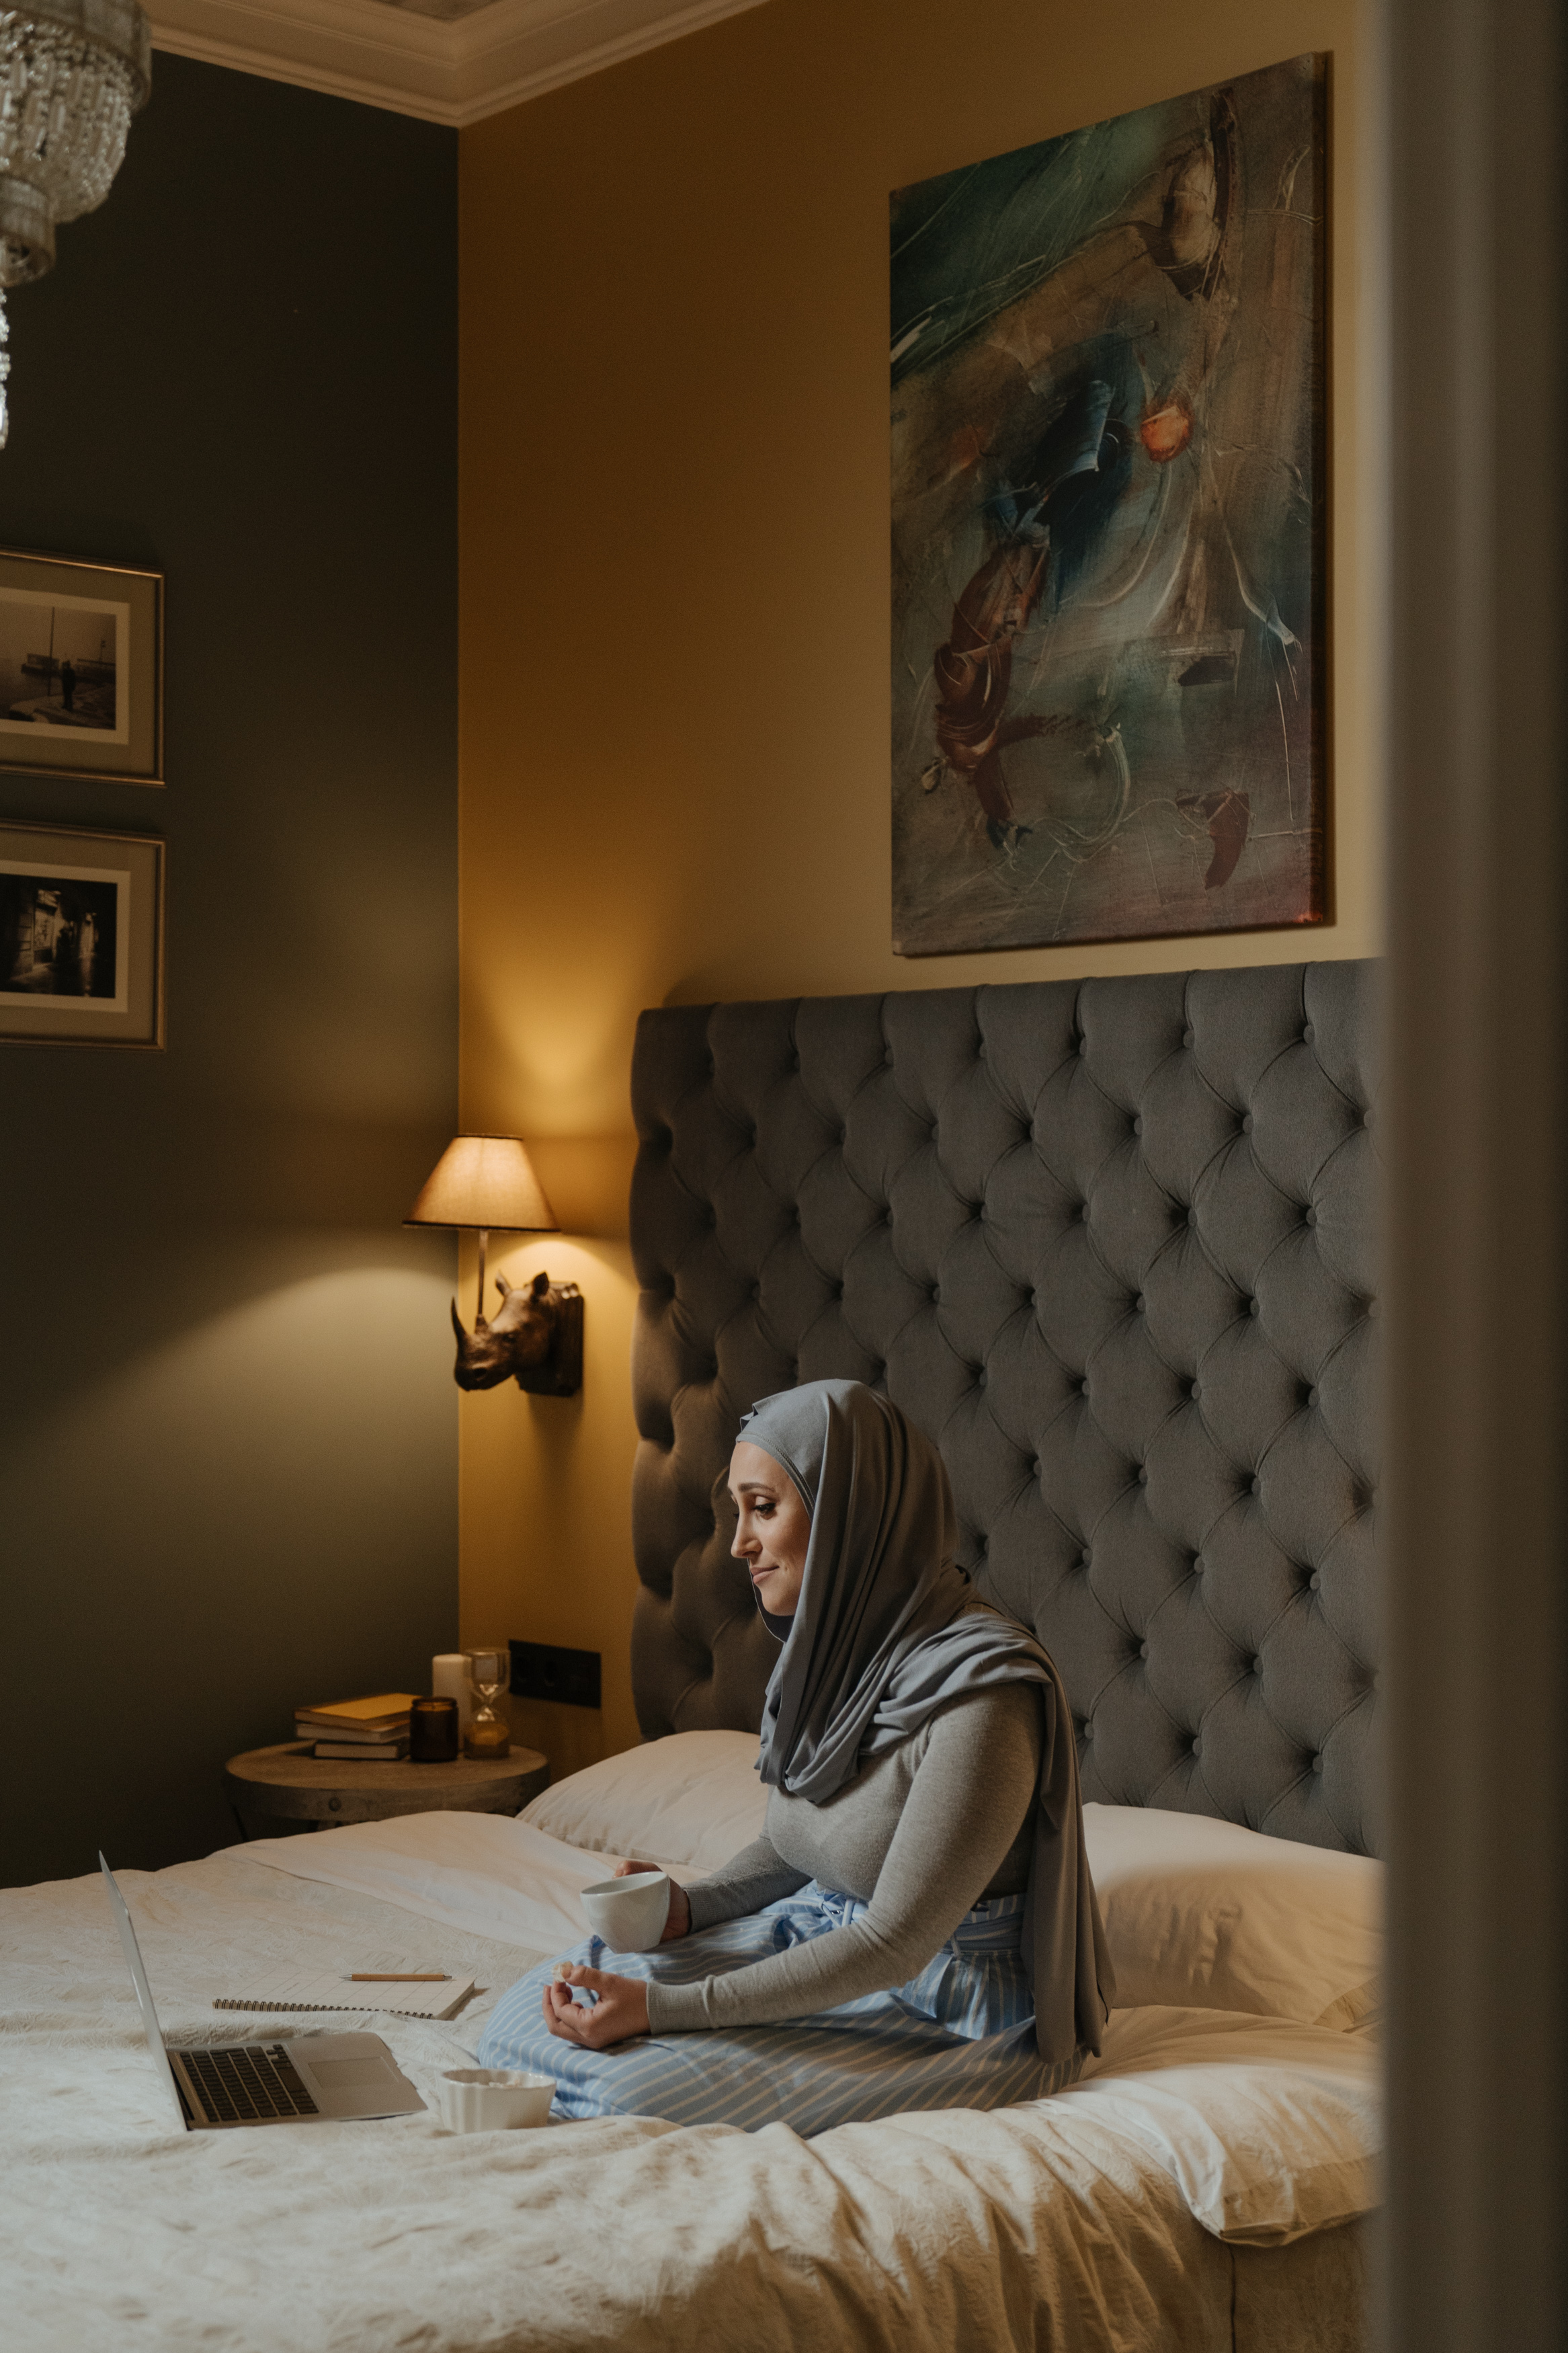 woman in gray hijab using laptop